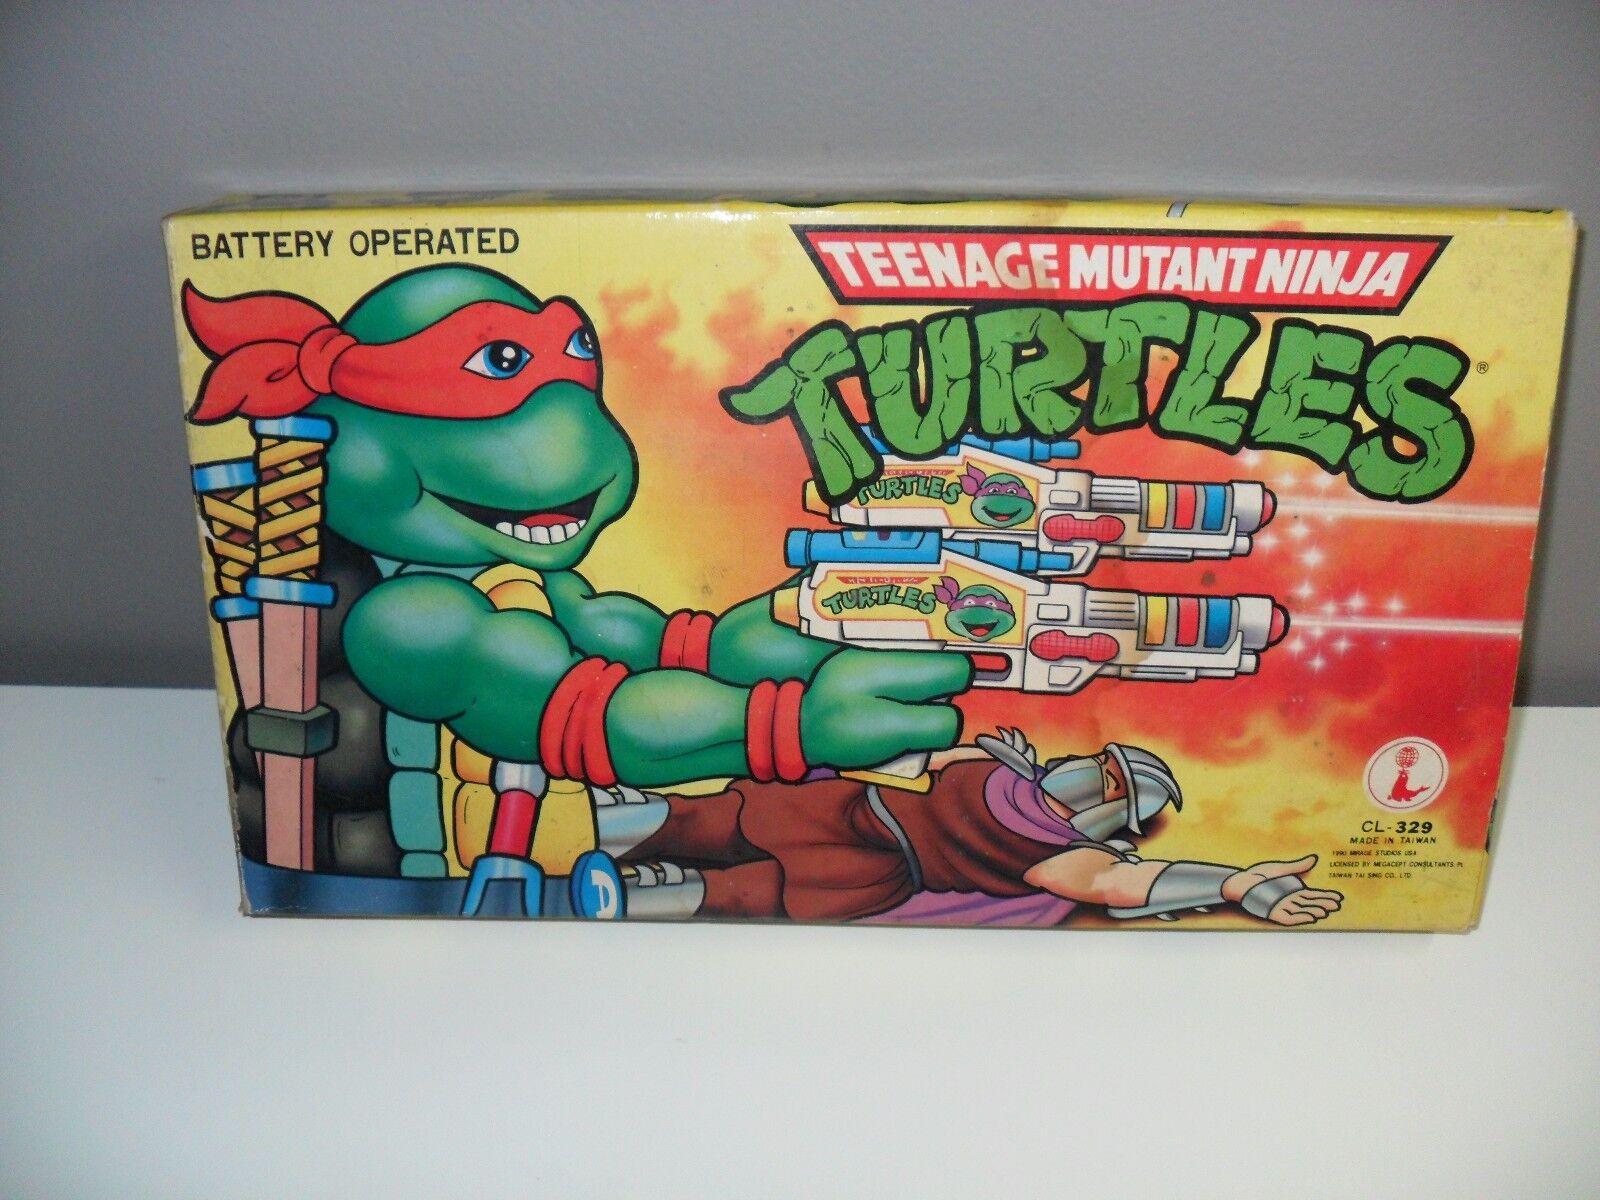 muy popular VHTF 1990 Teenage Mutant Mutant Mutant Ninja Turtles Tmnt Pistola Pistola De Juguete Con Pilas  garantía de crédito